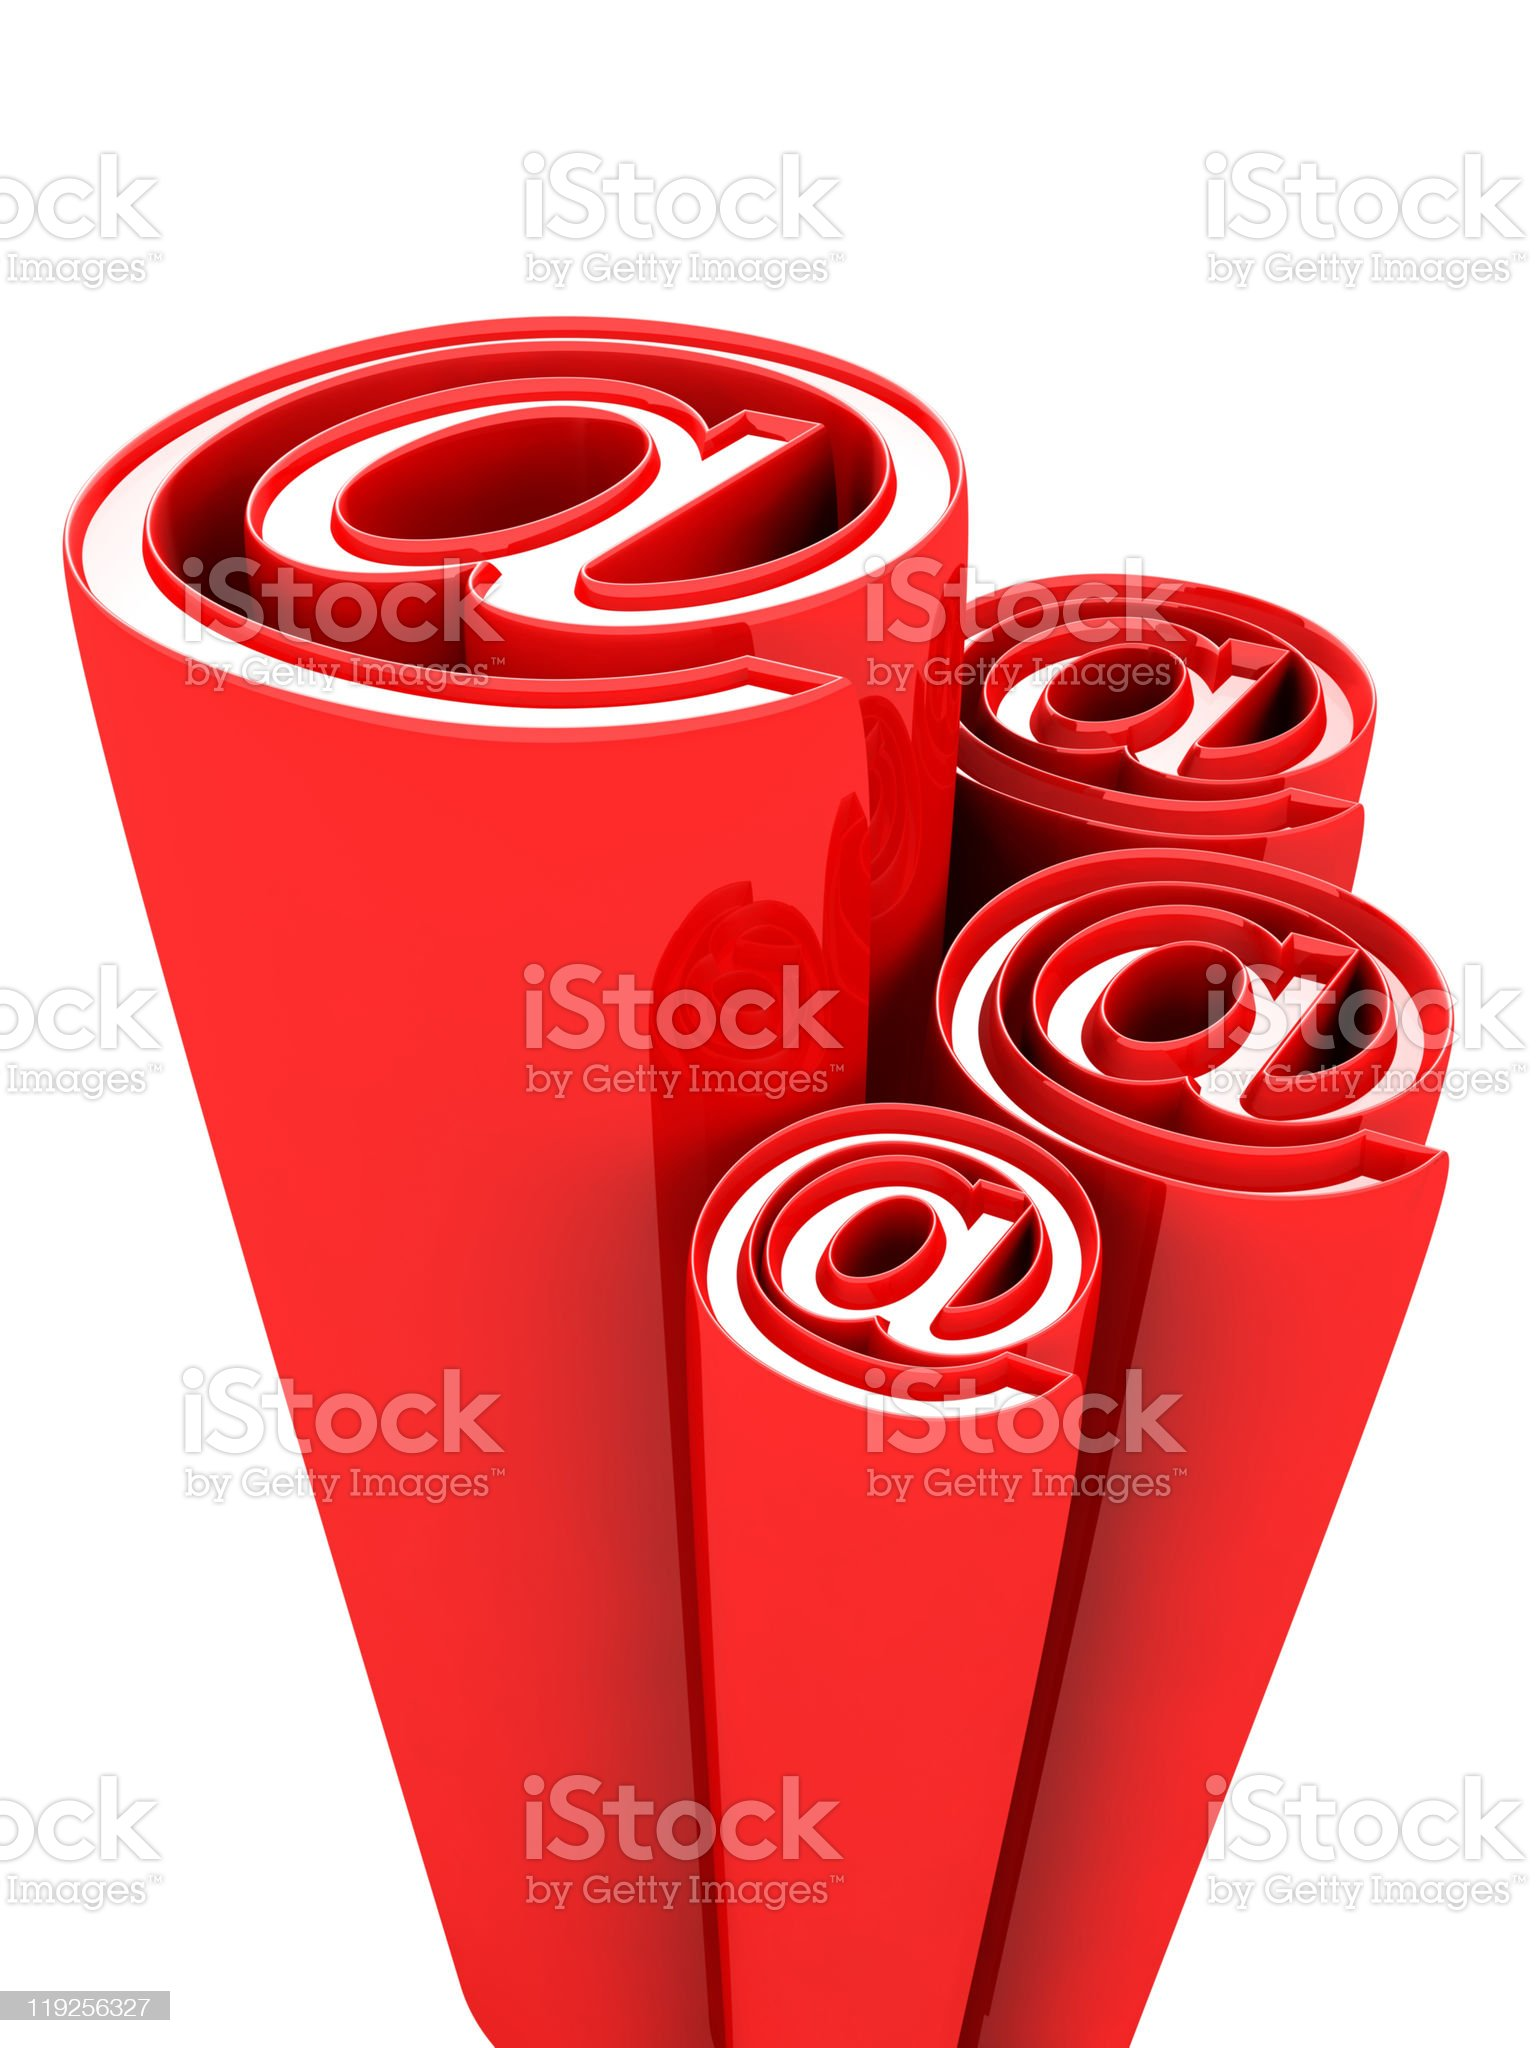 Email alias concept symbol decorative design element royalty-free stock vector art